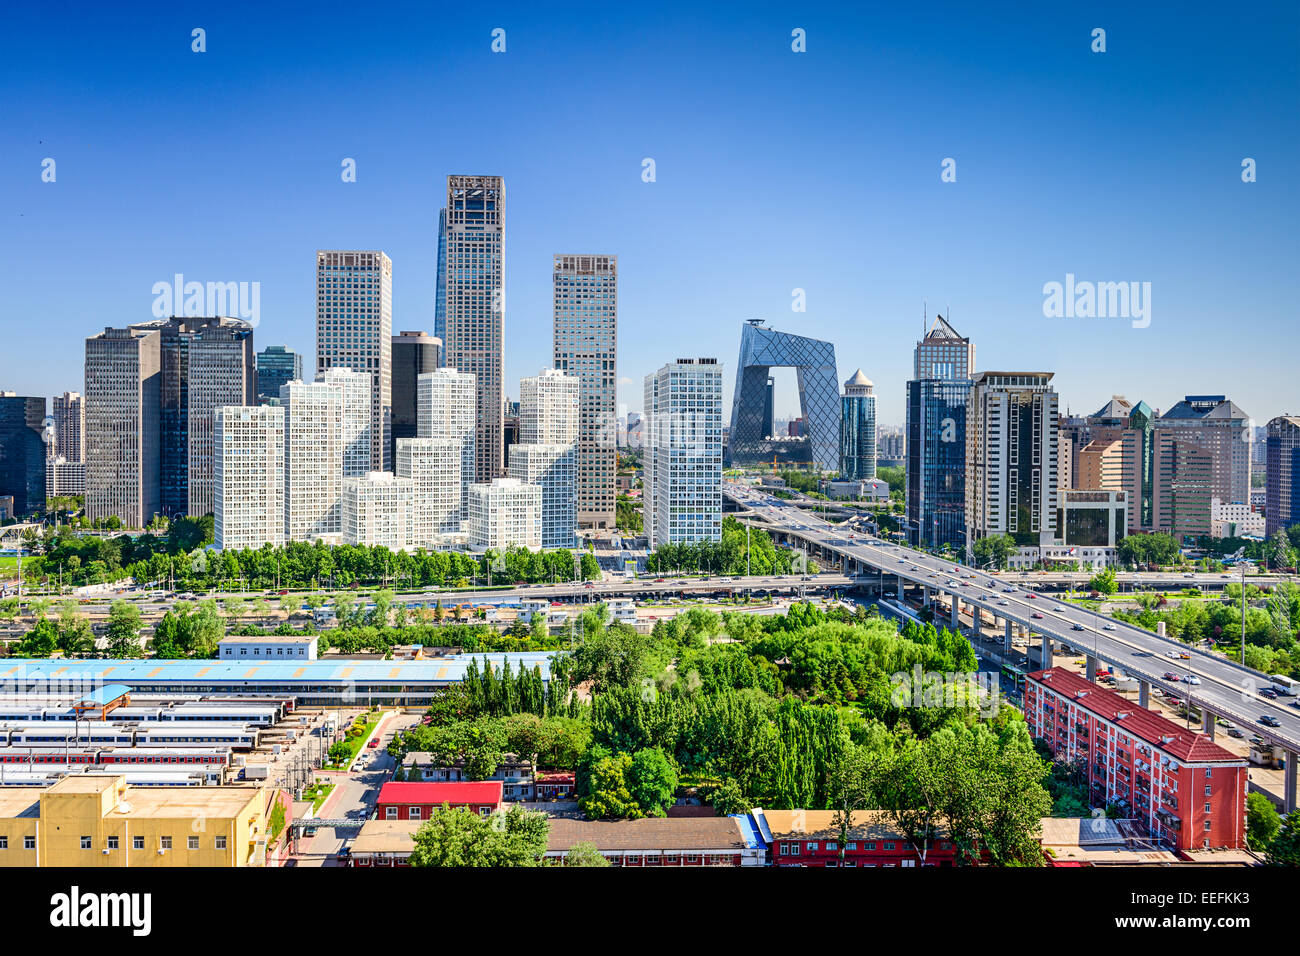 Beijing, China modern financial district skyline. - Stock Image